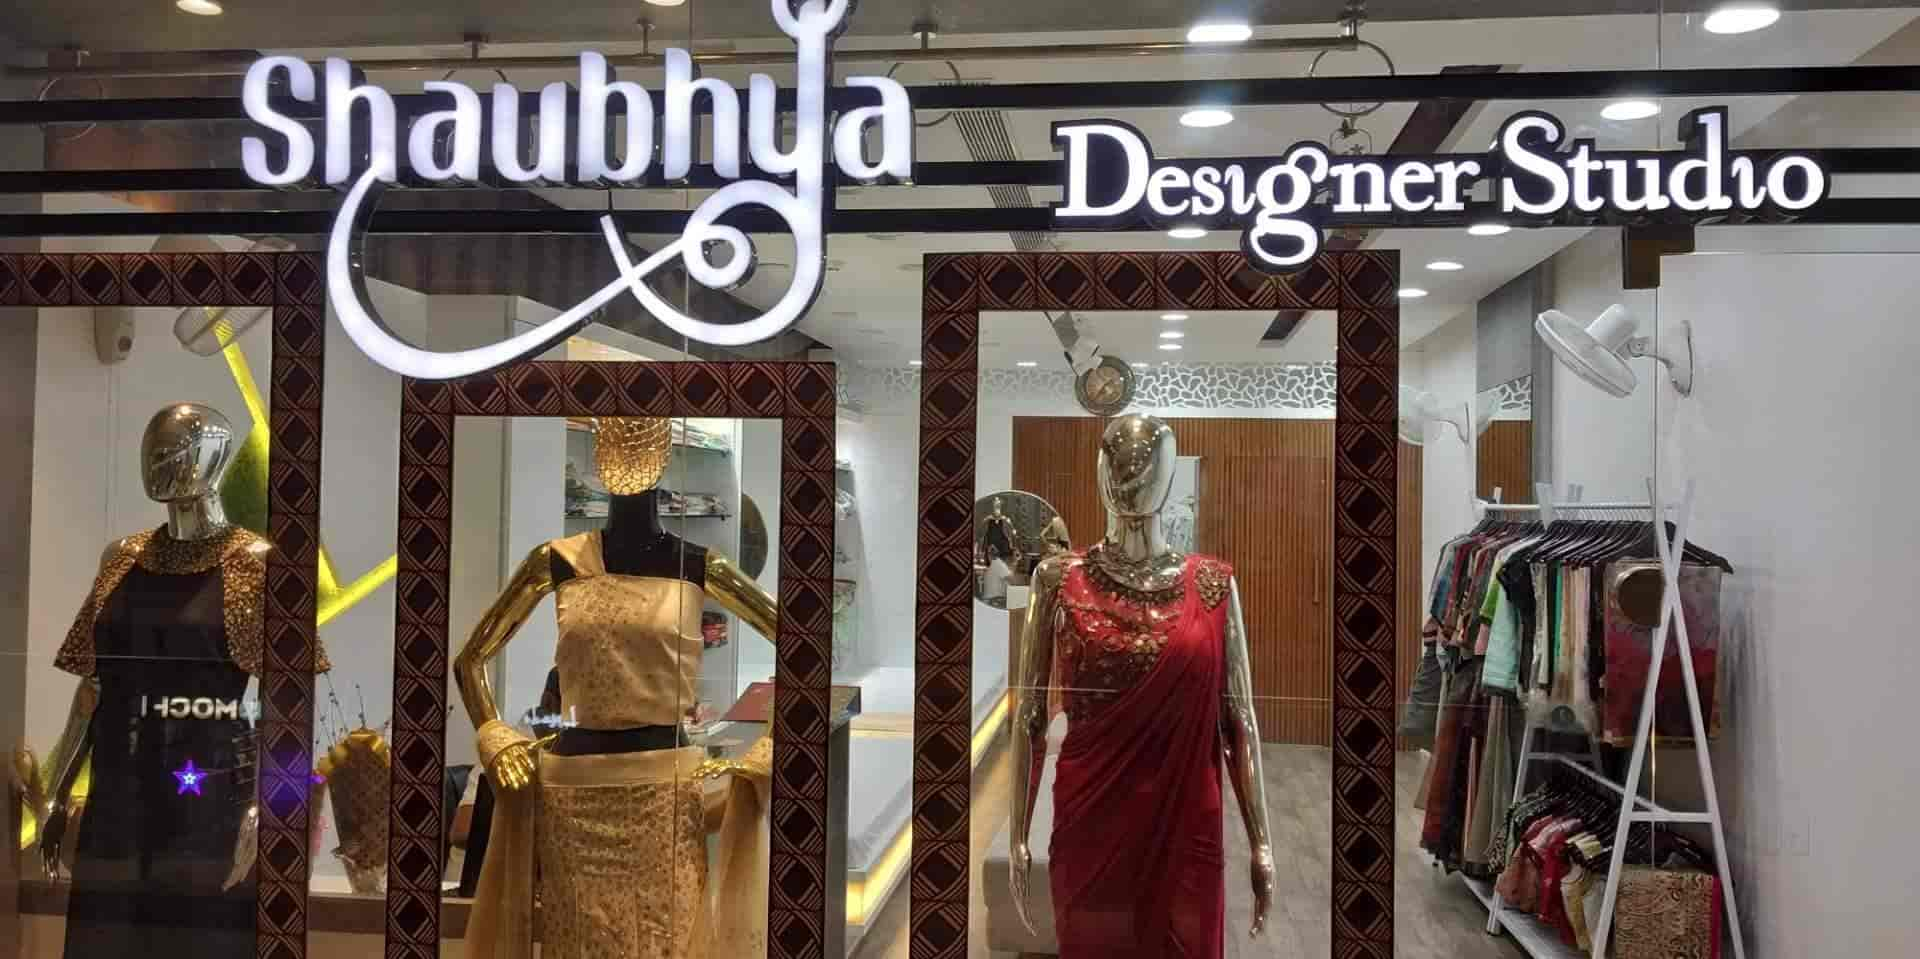 Shaubhya Designer Studio Iscon Mall Dumas Road Fashion Designers In Surat Justdial